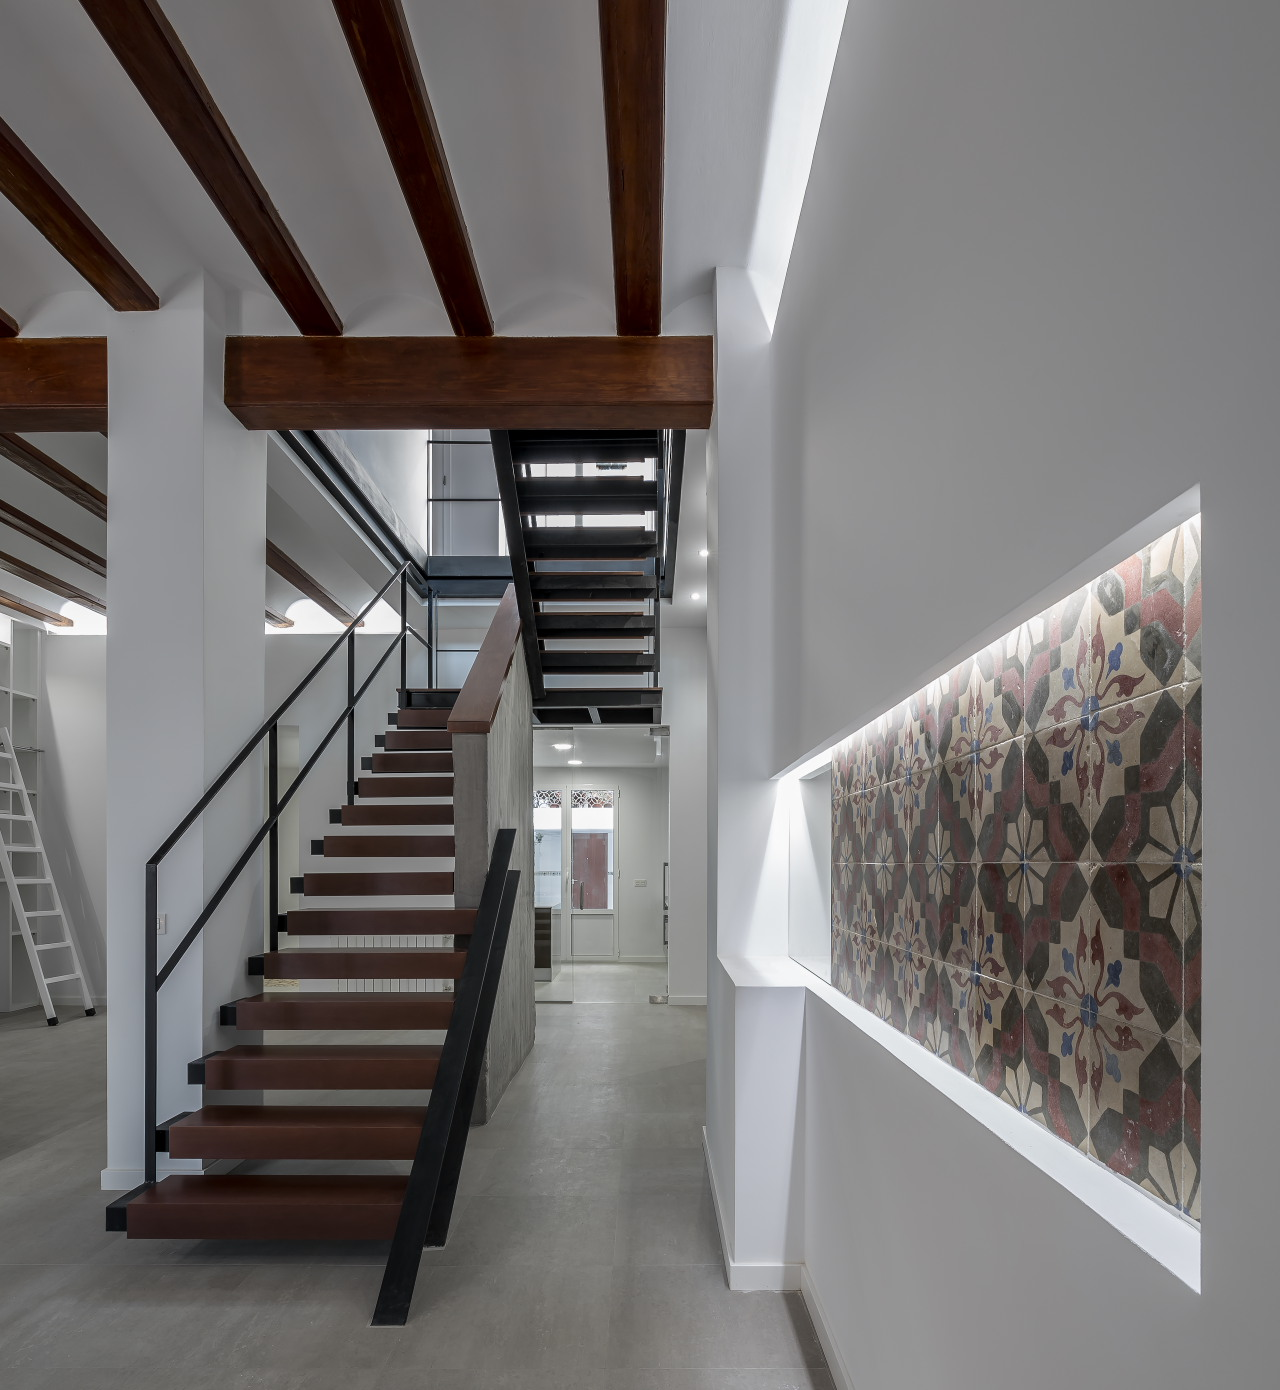 fotografia-arquitectura-valencia-german-cabo-viraje-rehabilitacion-campanar (8)